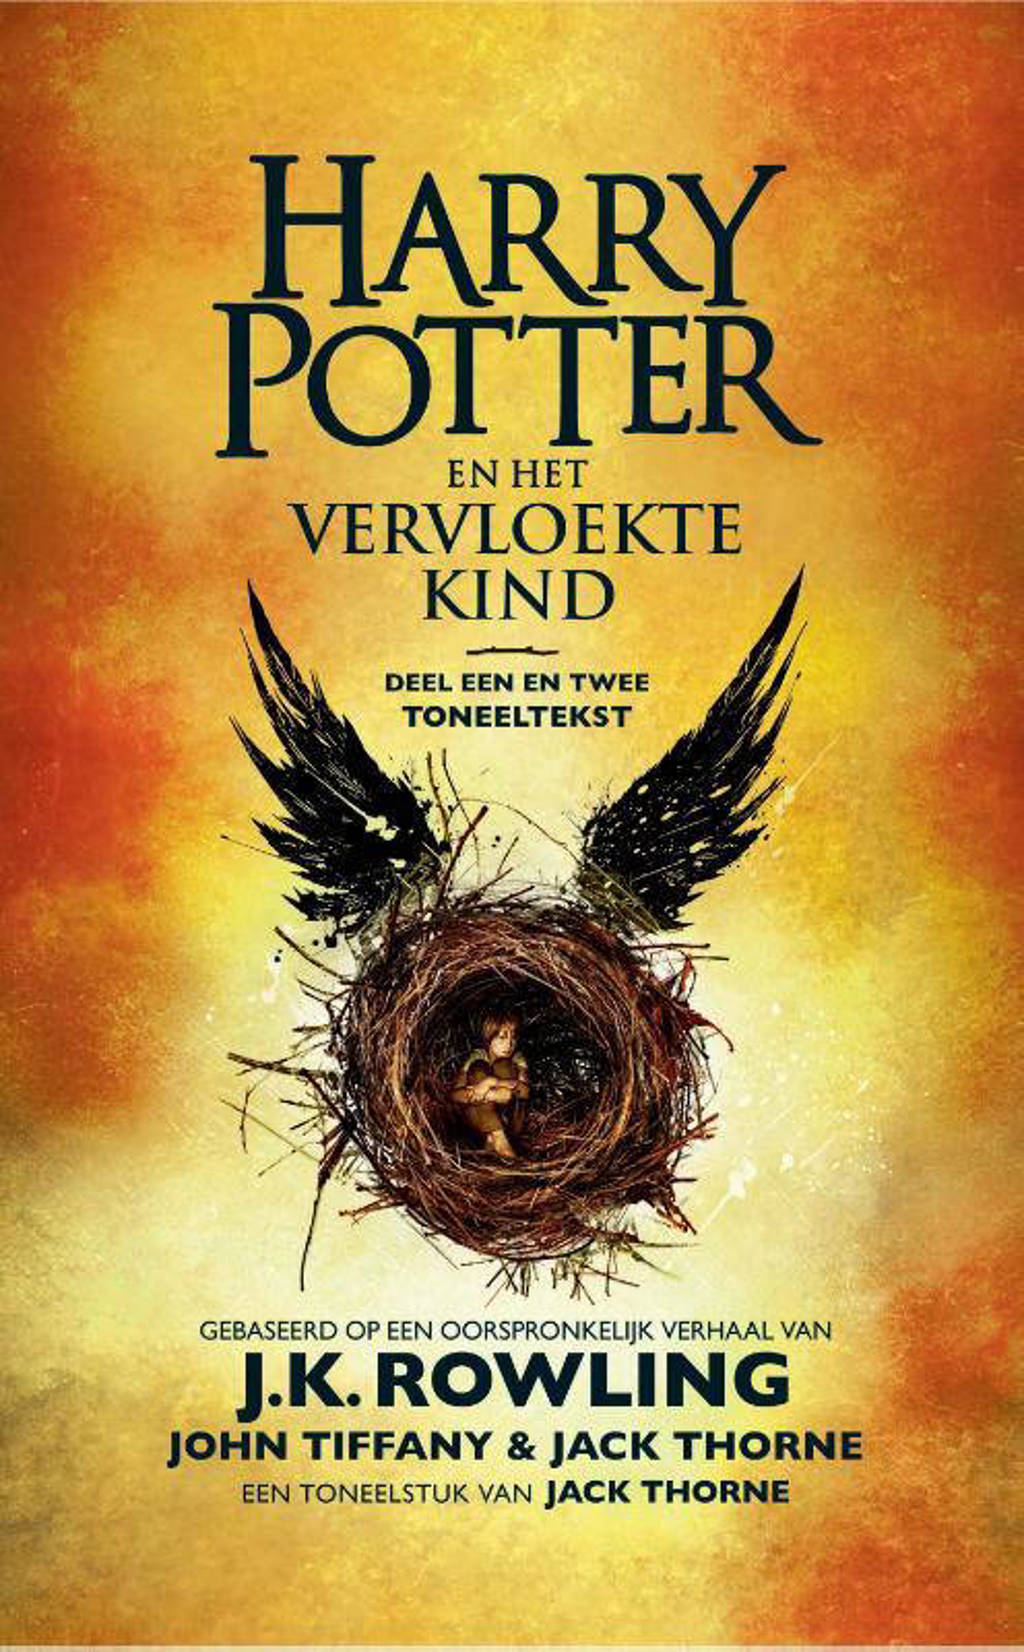 Harry Potter: Harry Potter en het vervloekte kind - J.K. Rowling, John Tiffany en Jack Thorne